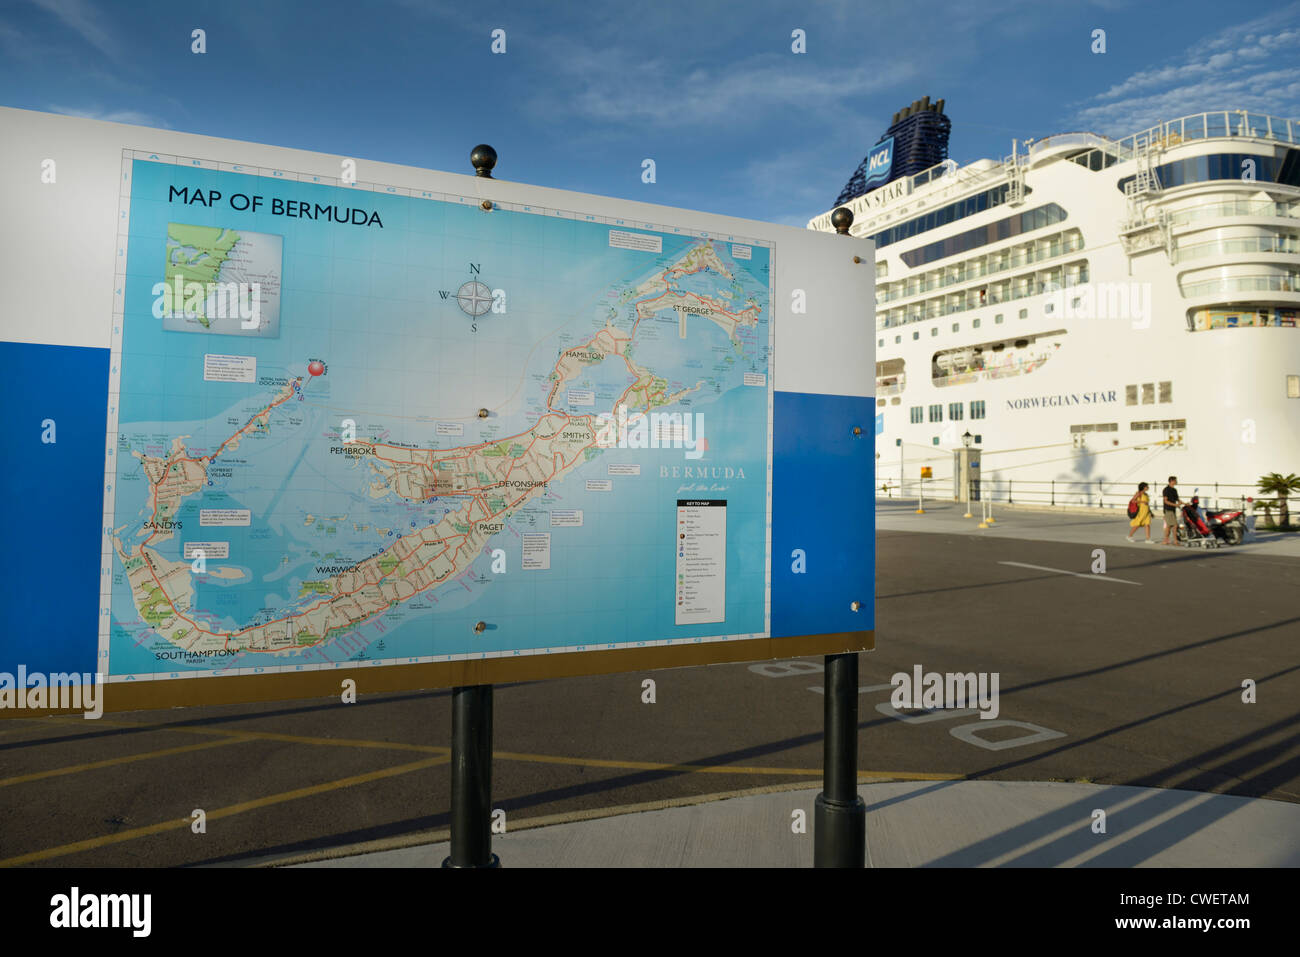 Bermuda King's Wharf dockyard with map and cruise ship - Stock Image